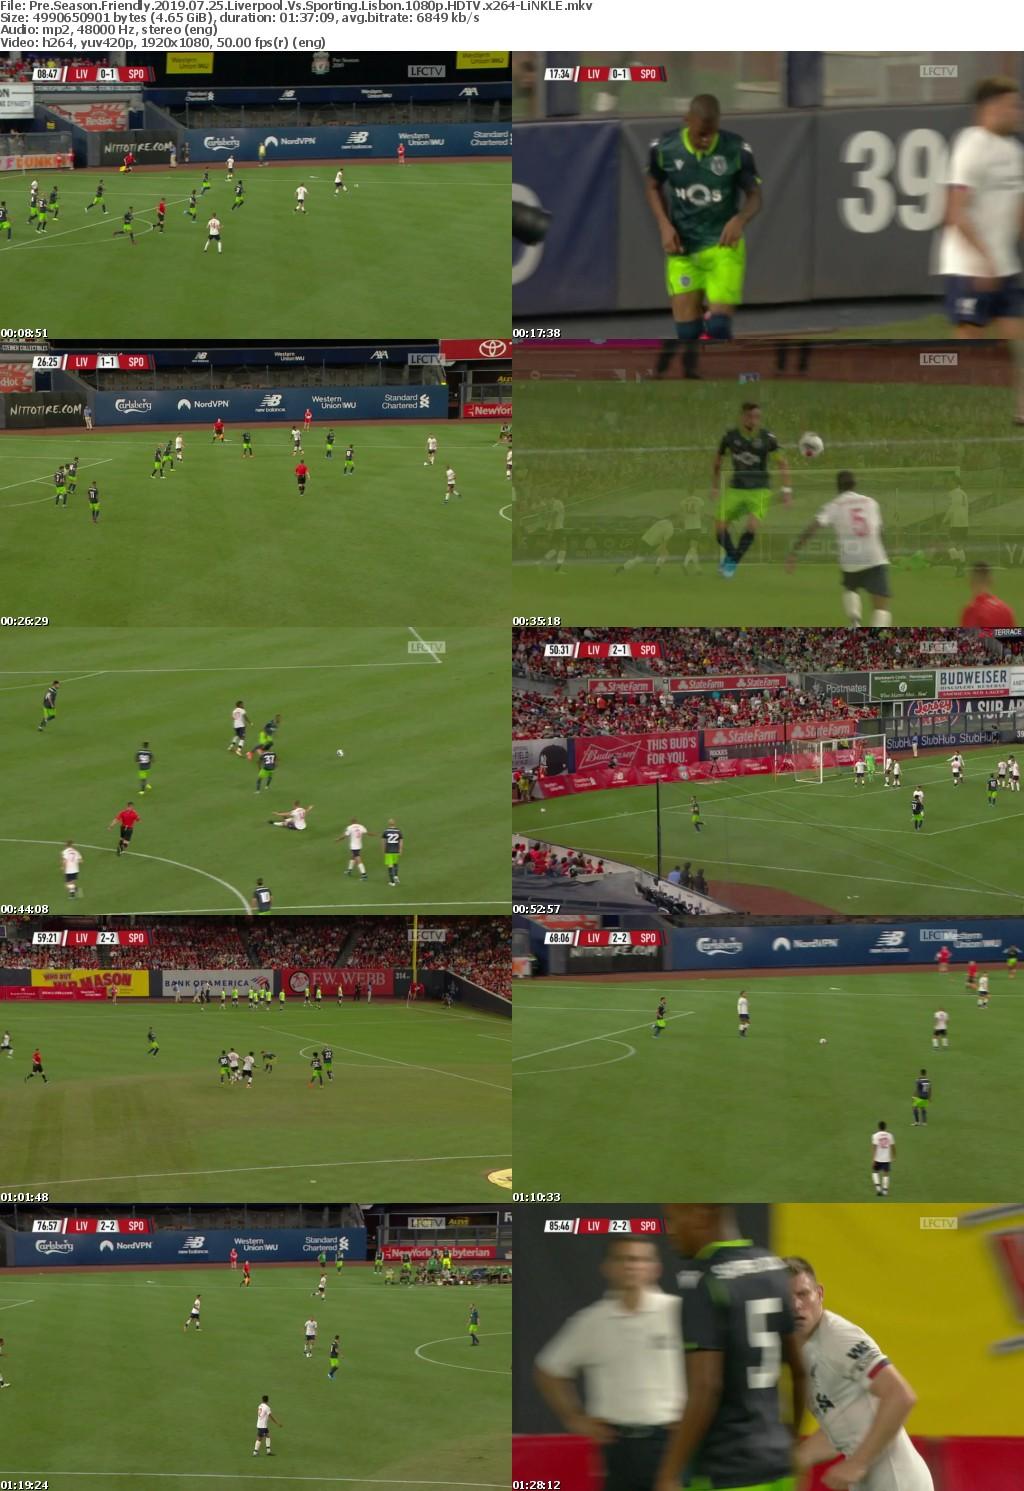 Pre Season Friendly 2019 07 25 Liverpool Vs Sporting Lisbon 1080p HDTV x264-LiNKLE